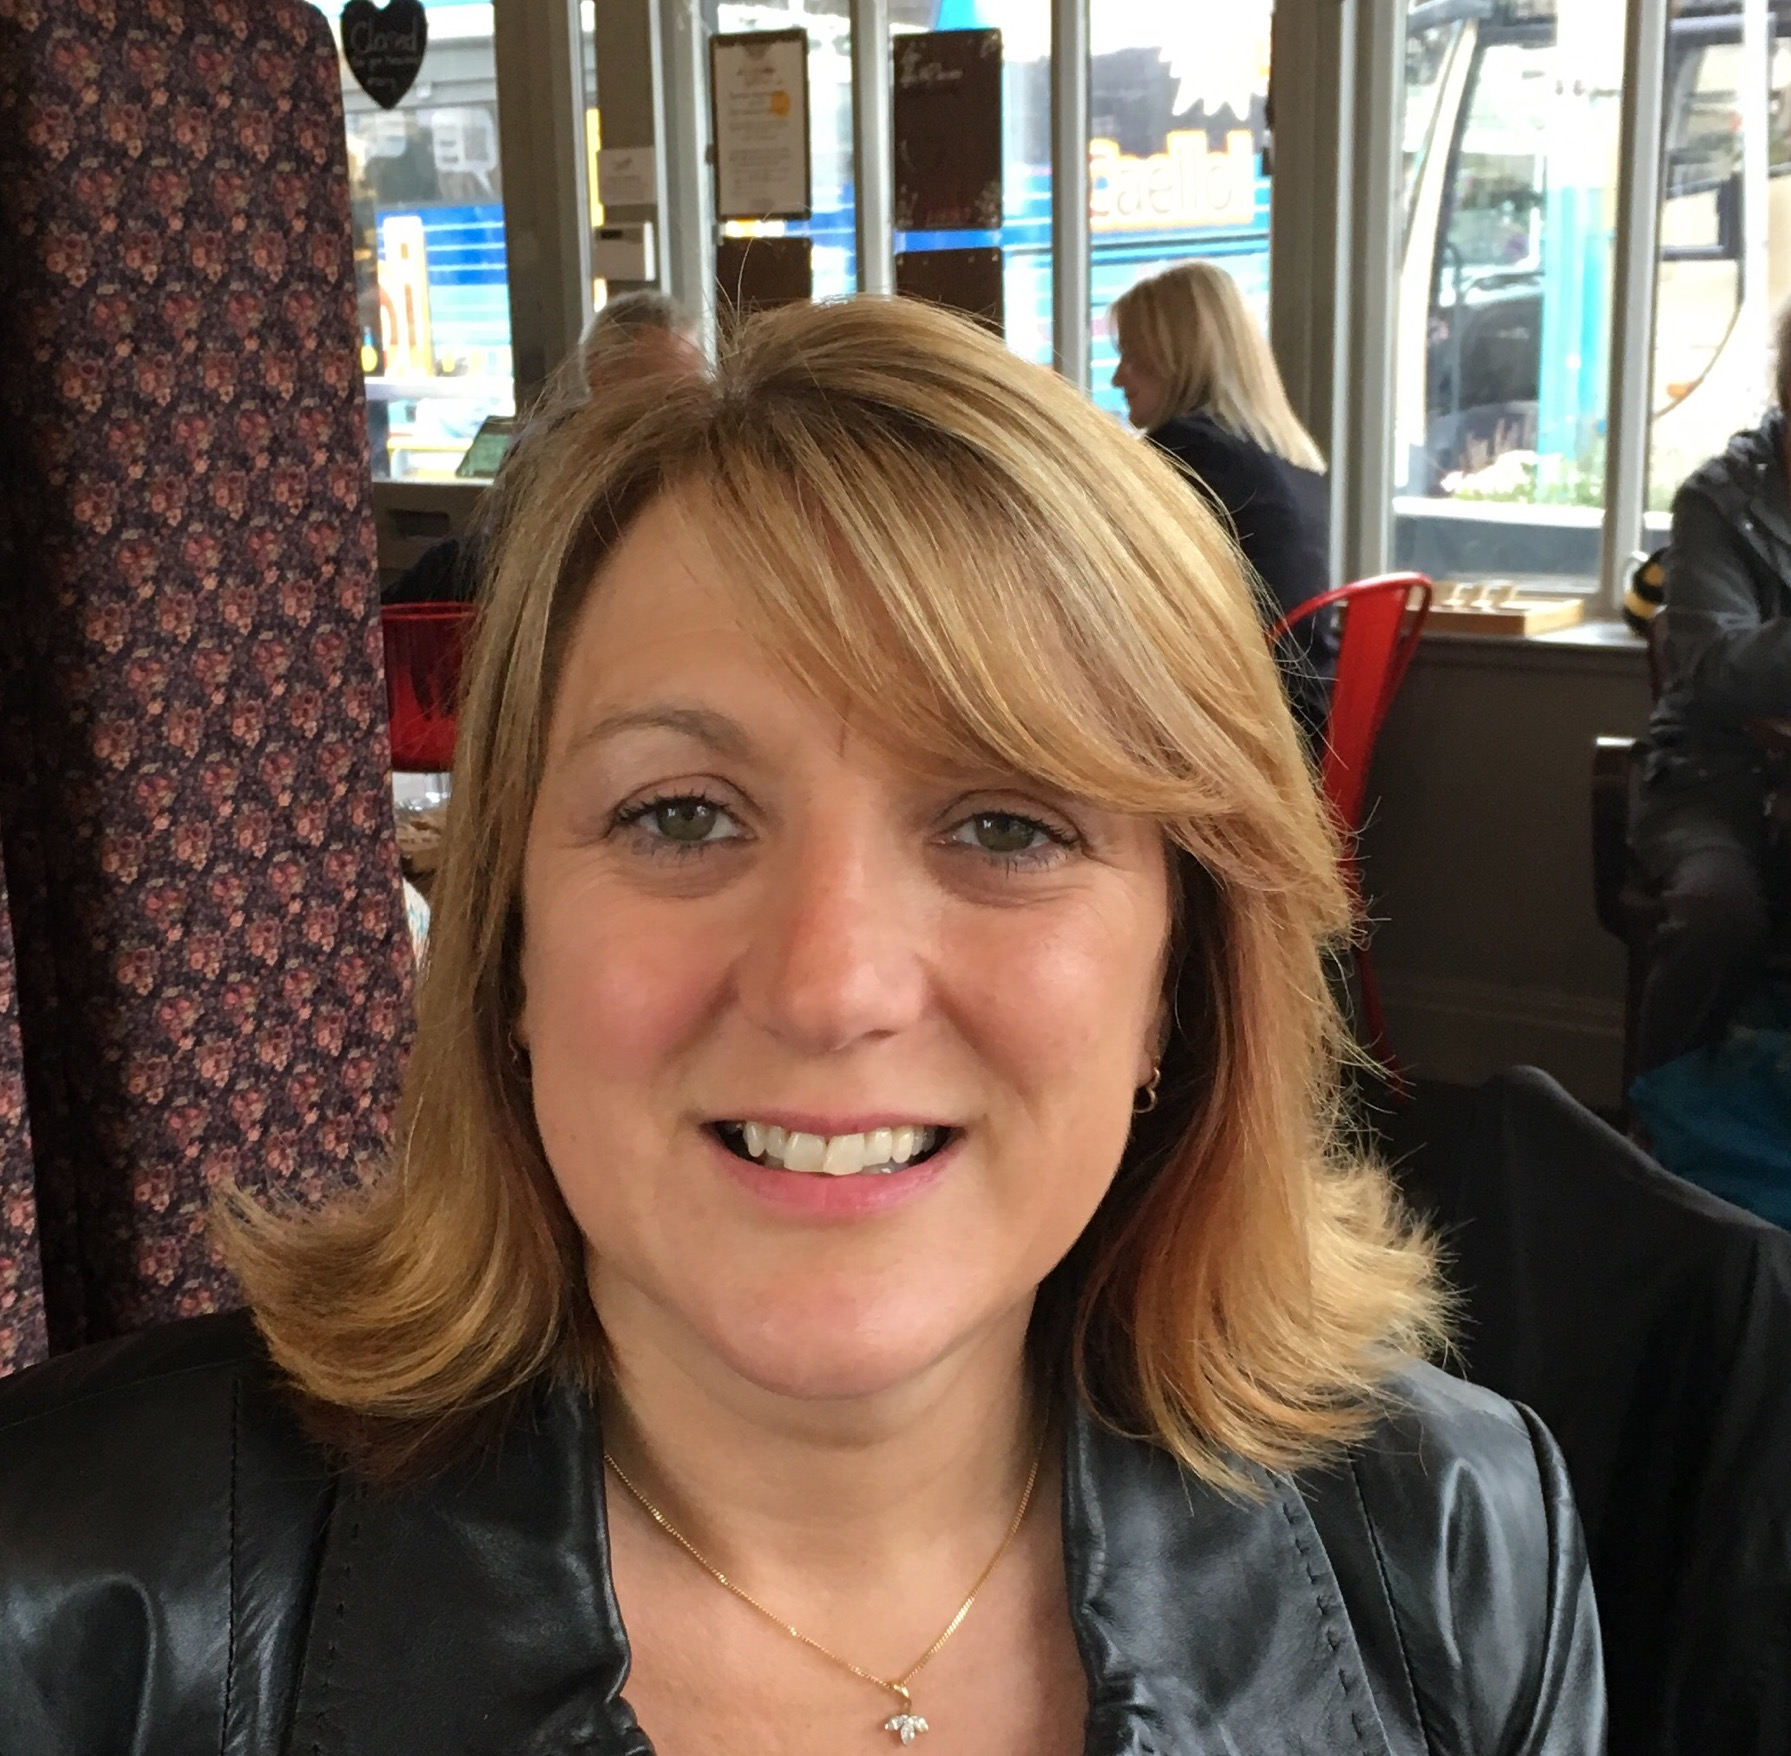 Mrs Pauline Mcloughlins photo